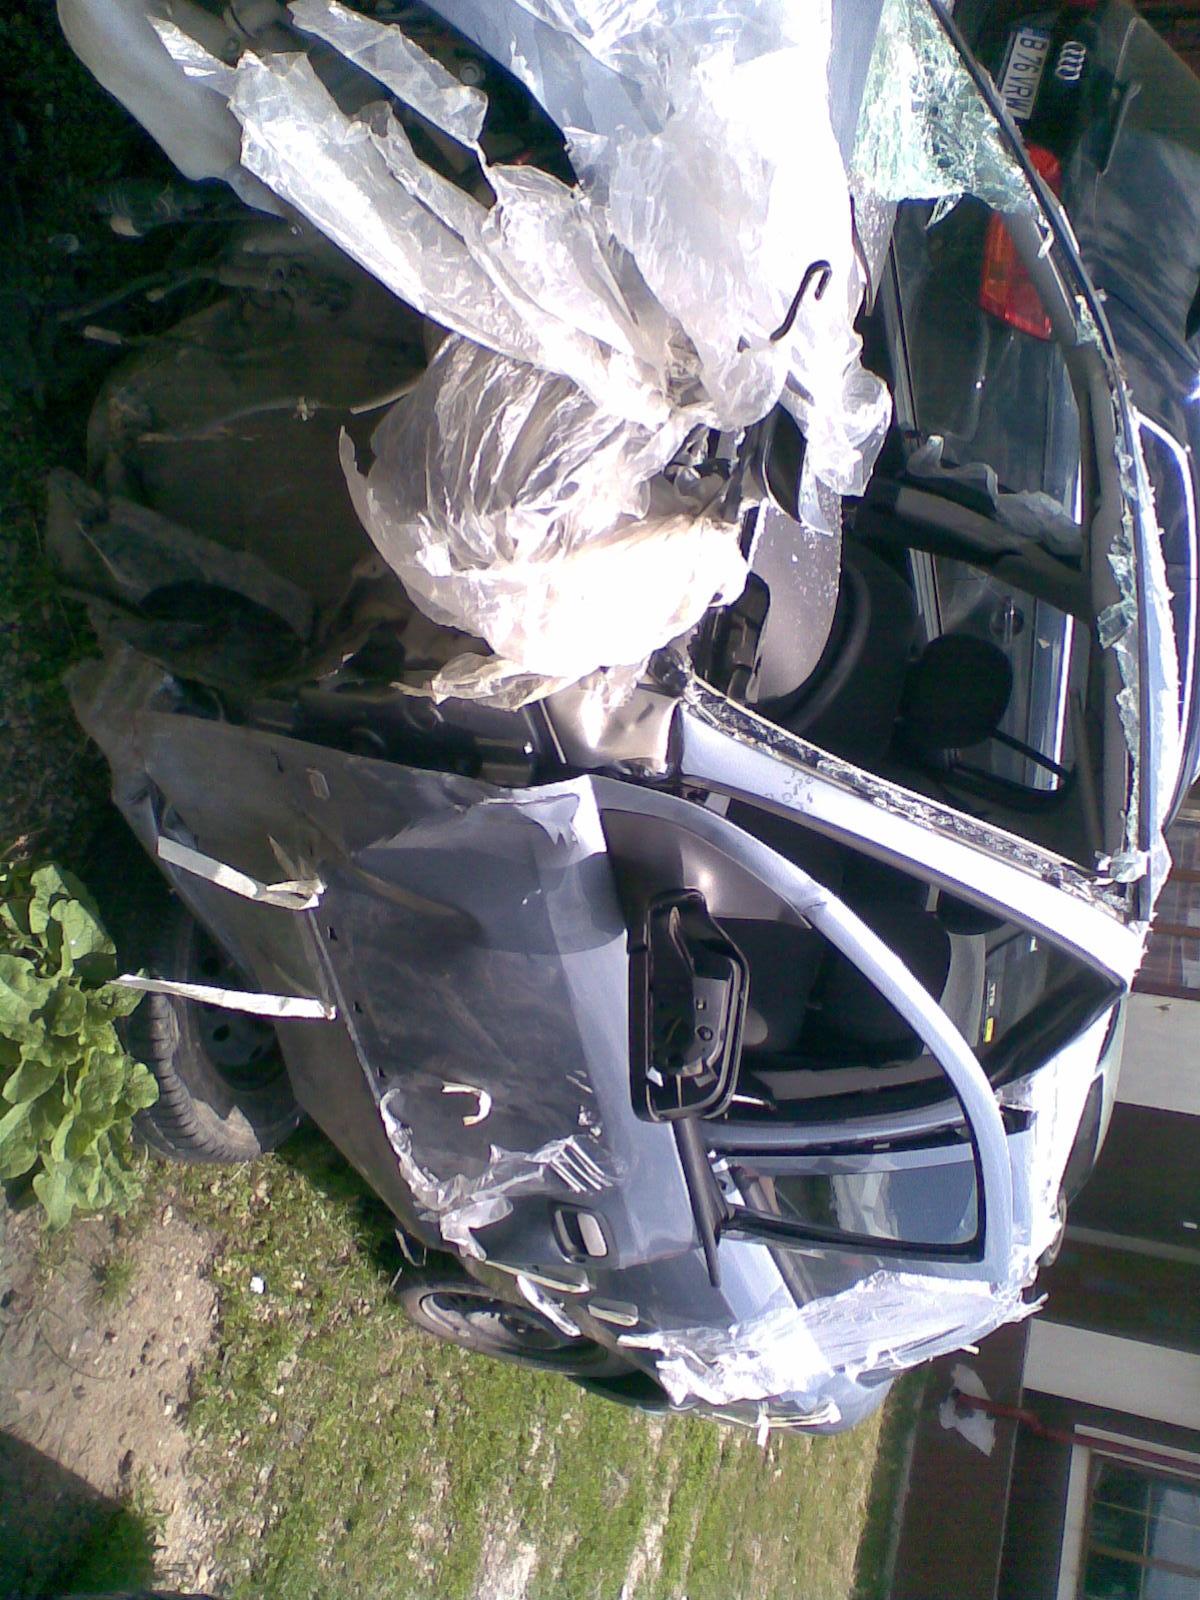 Opel Astra-G avariat 2006 Benzina Hatchback - 05 Iunie 2013 - Poza 2